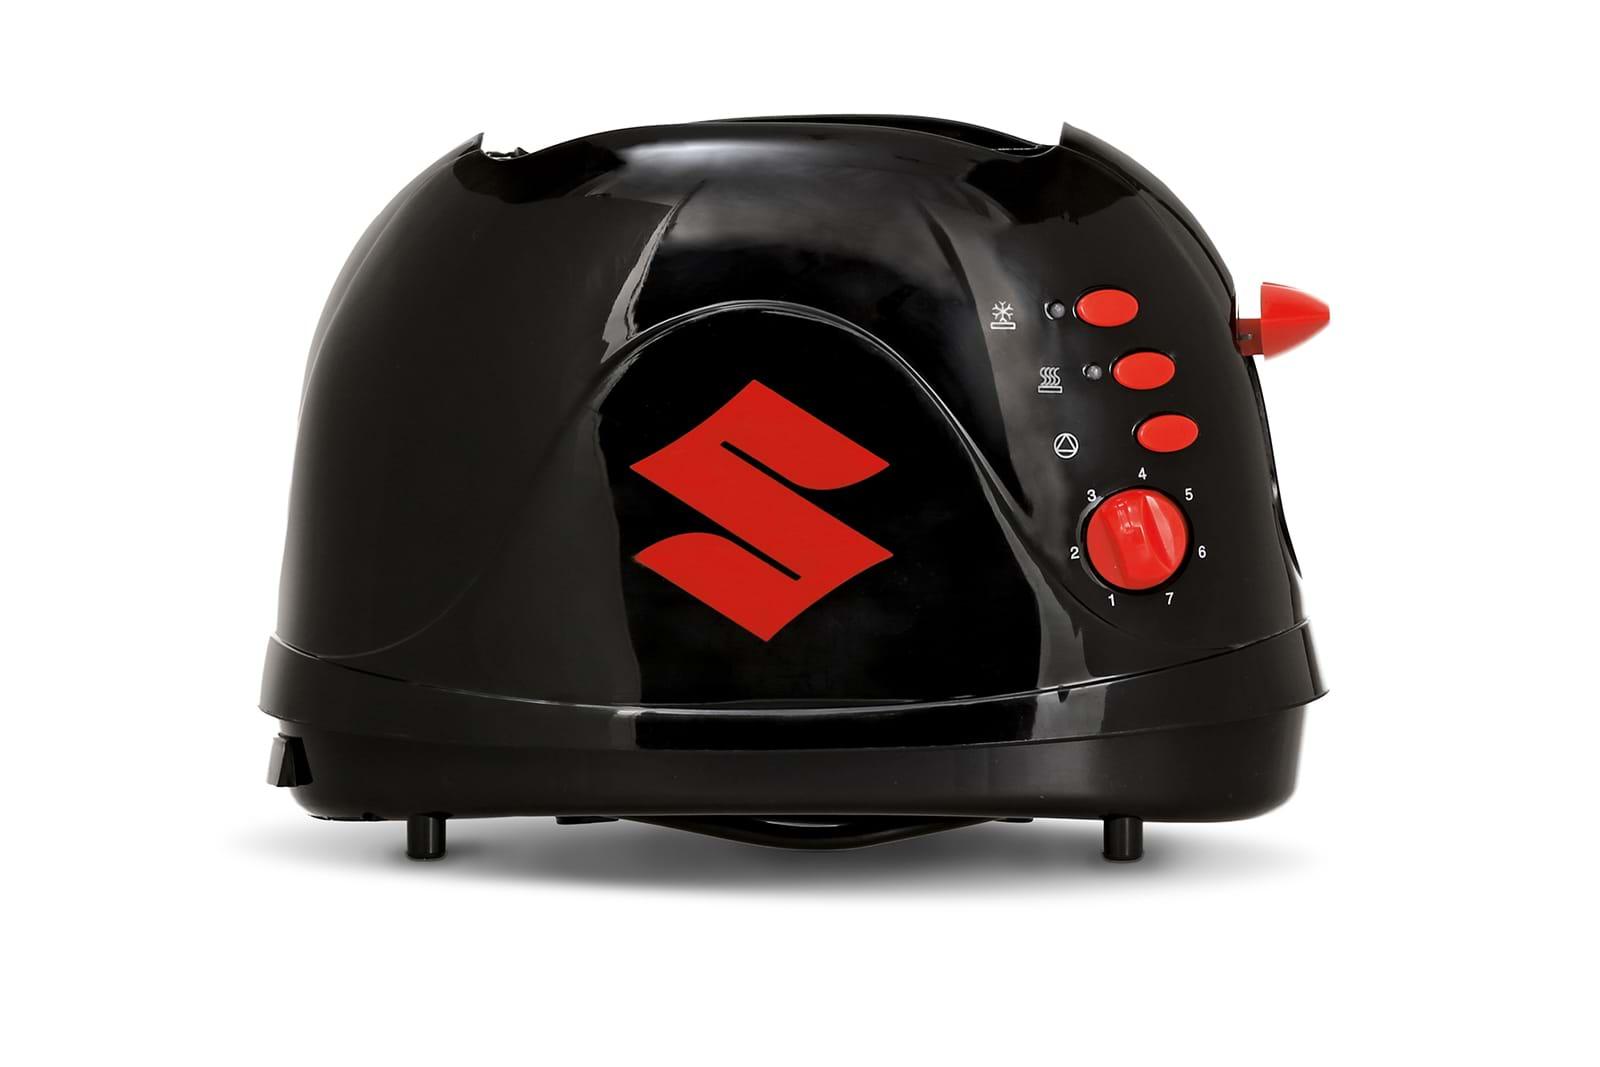 Suzuki toaster black